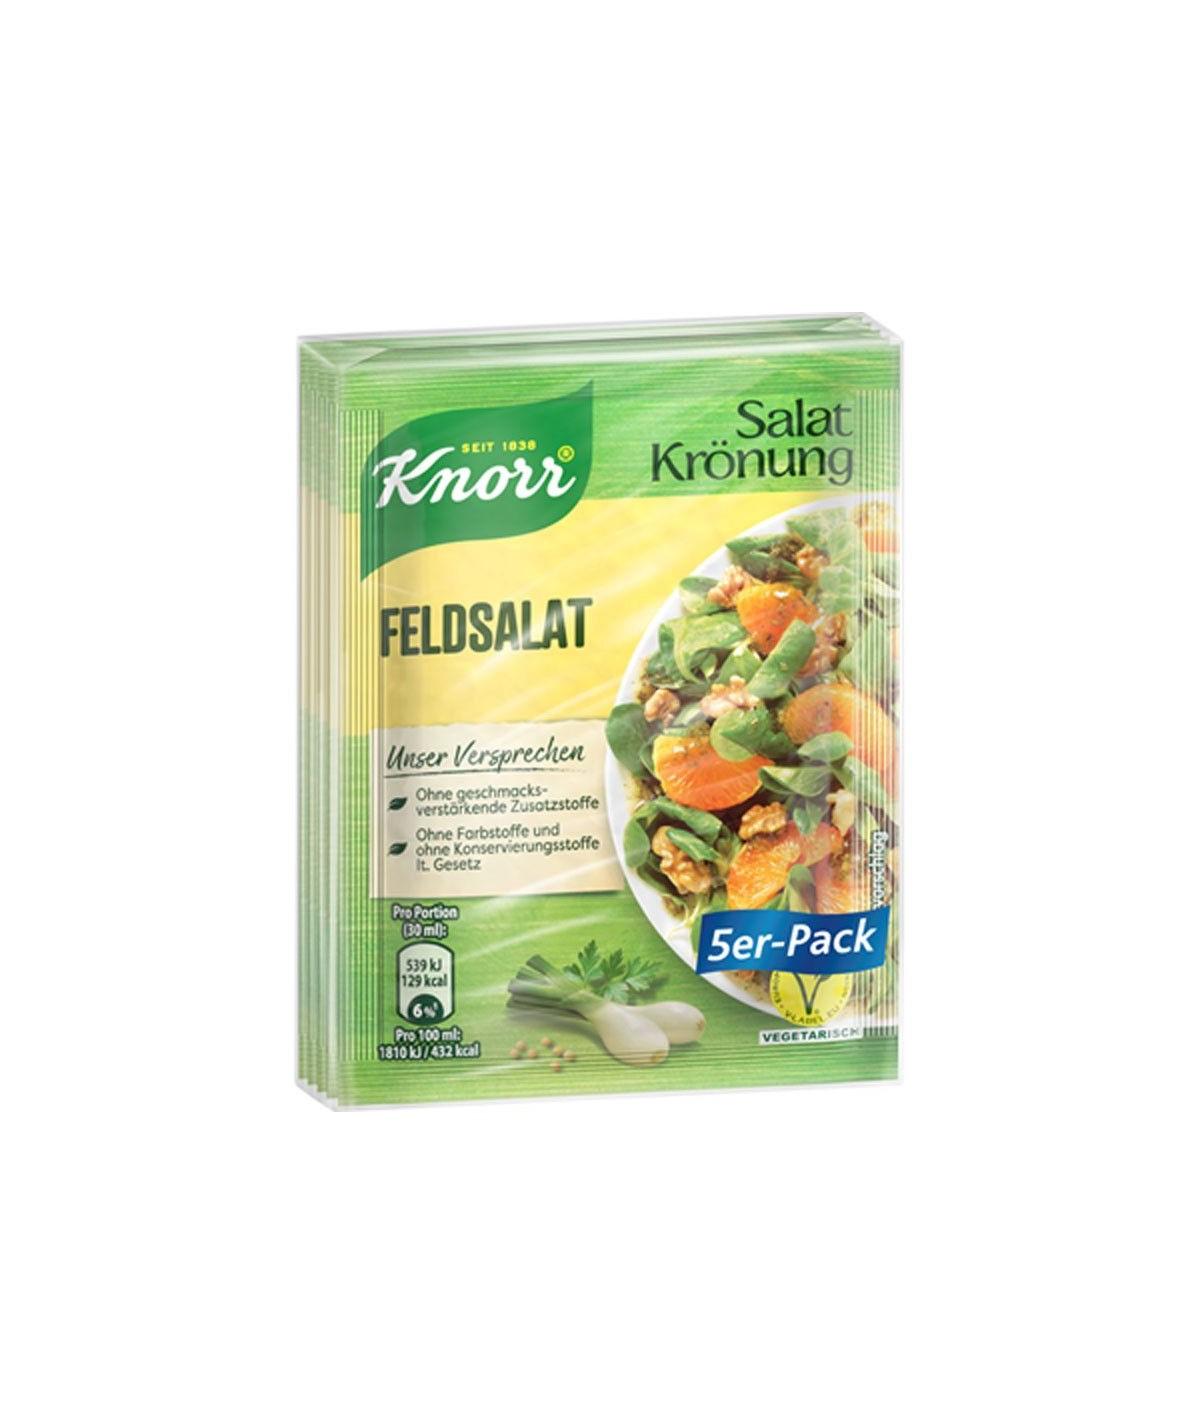 Salatkrönung 5er-Pack Feldsalat 40 g